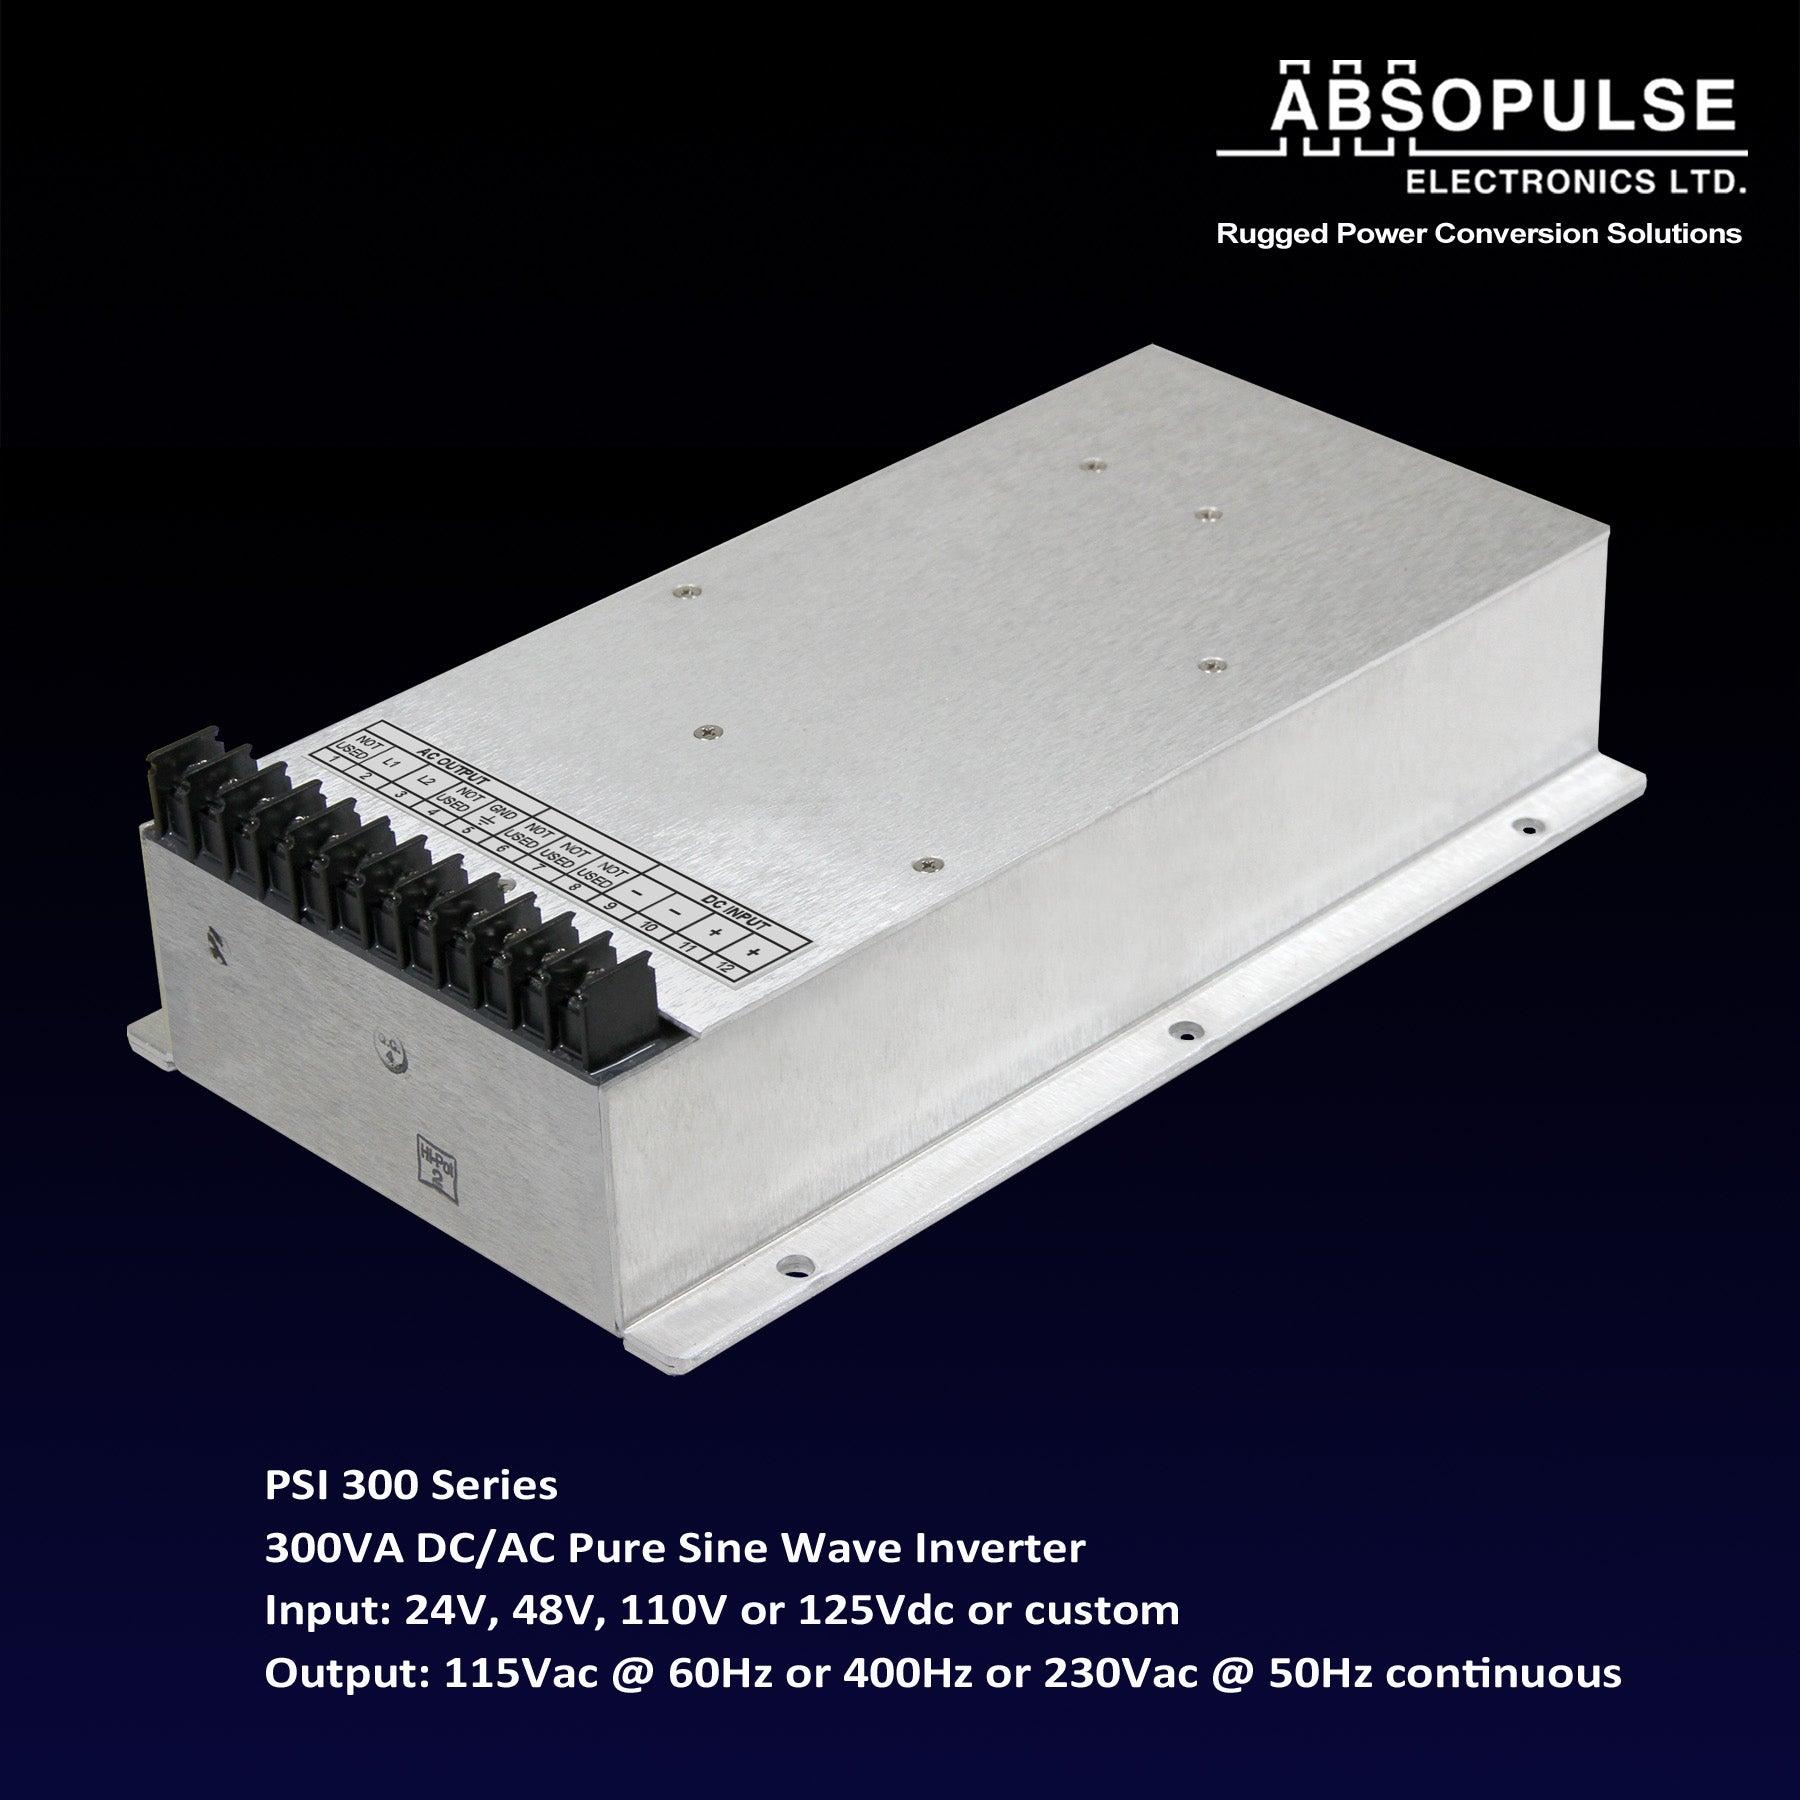 300VA Encapsulated Pure Sine Wave Inverter Suits Severe Environments